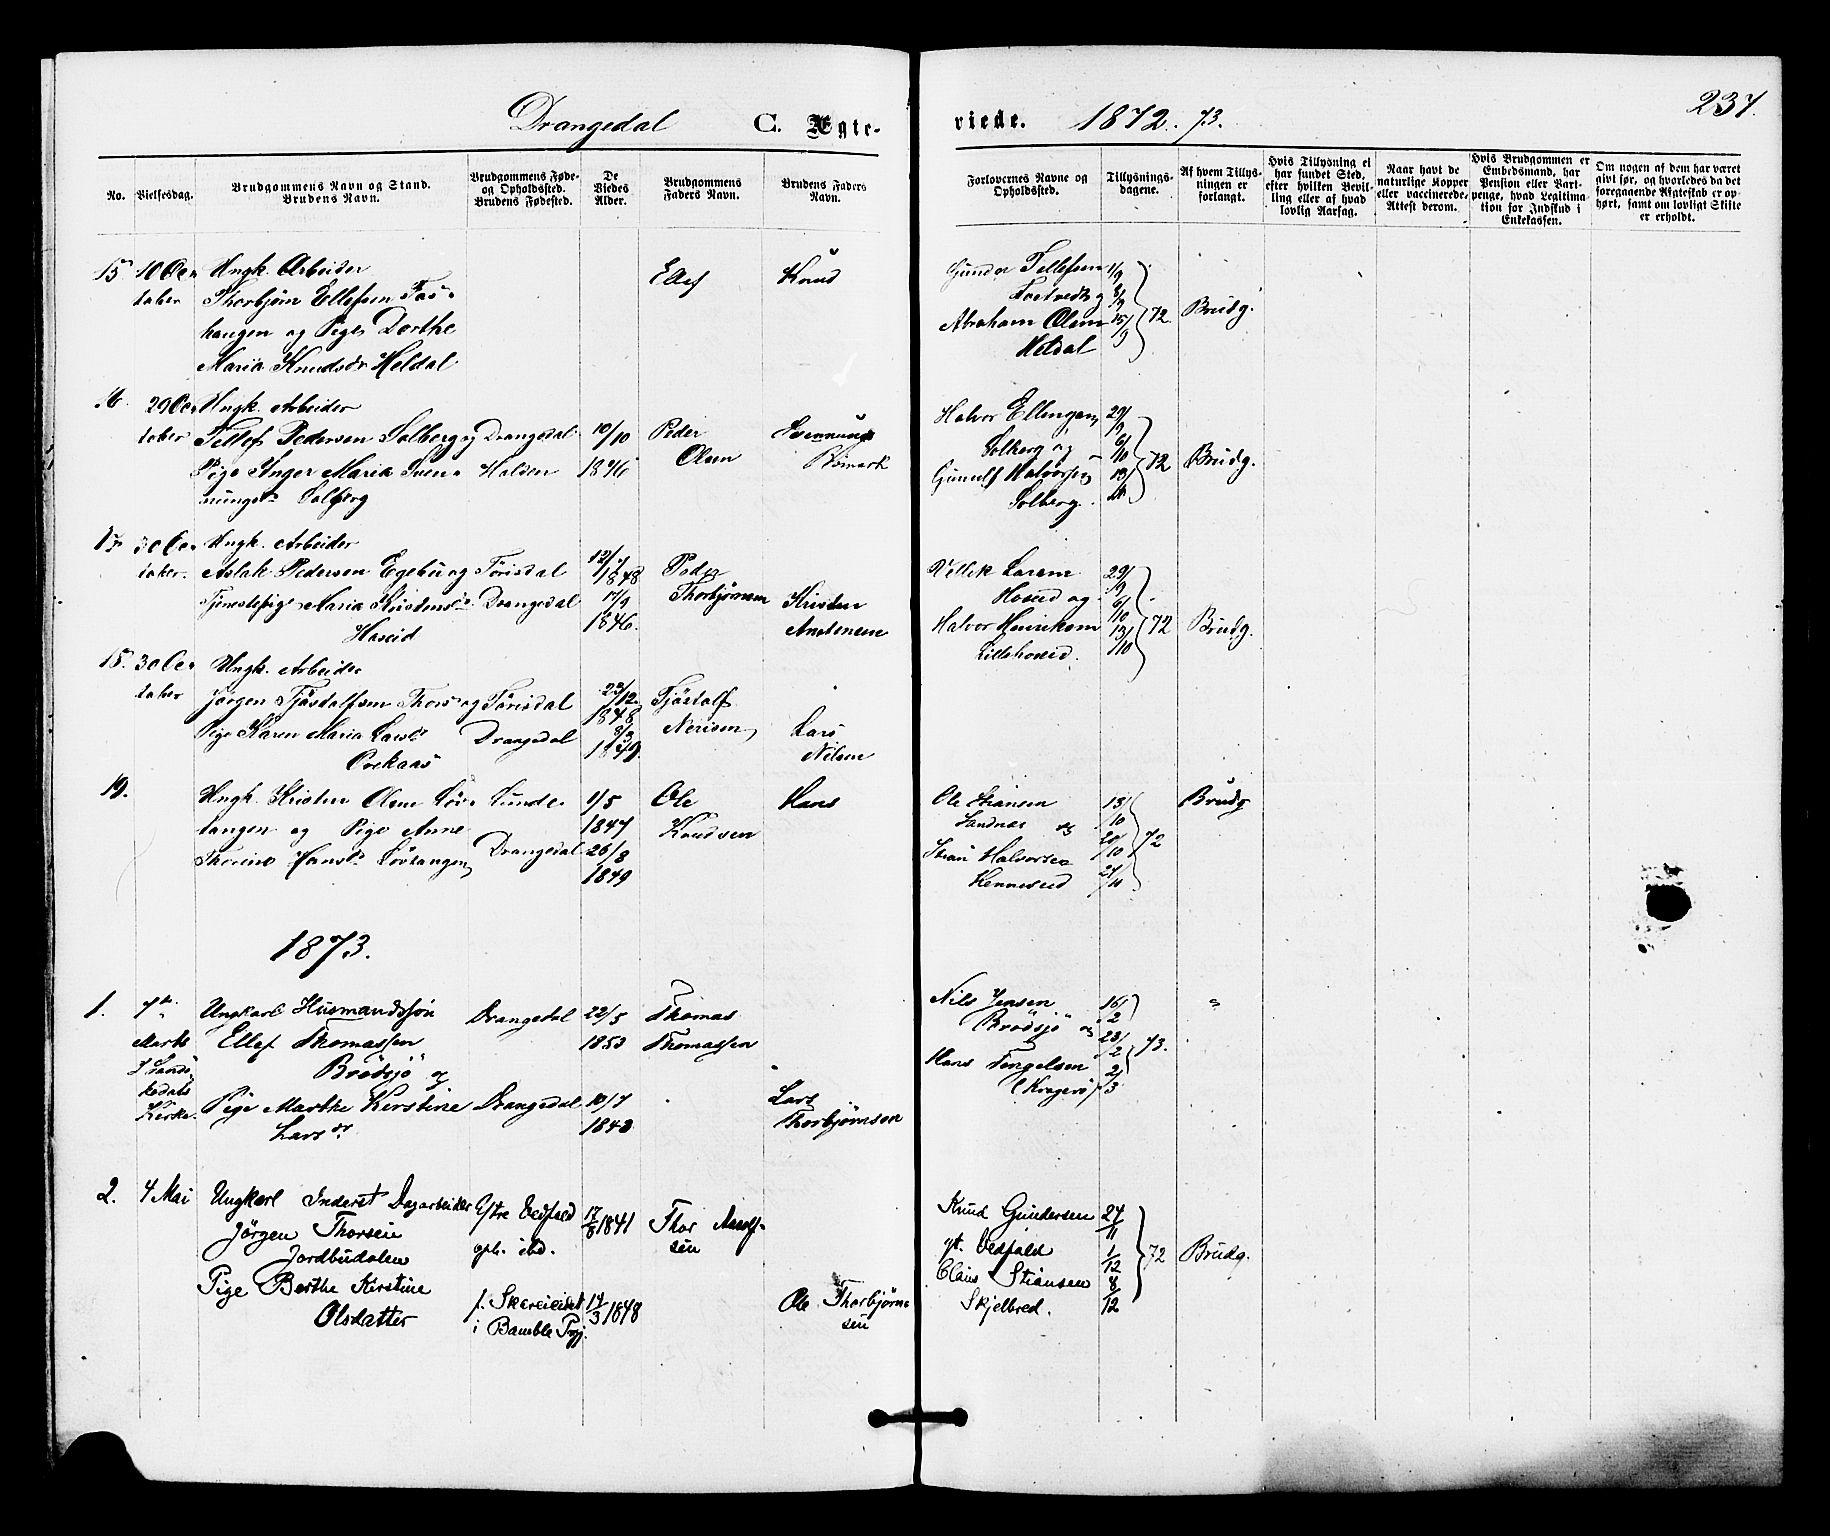 SAKO, Drangedal kirkebøker, F/Fa/L0009: Ministerialbok nr. 9 /1, 1872-1884, s. 237